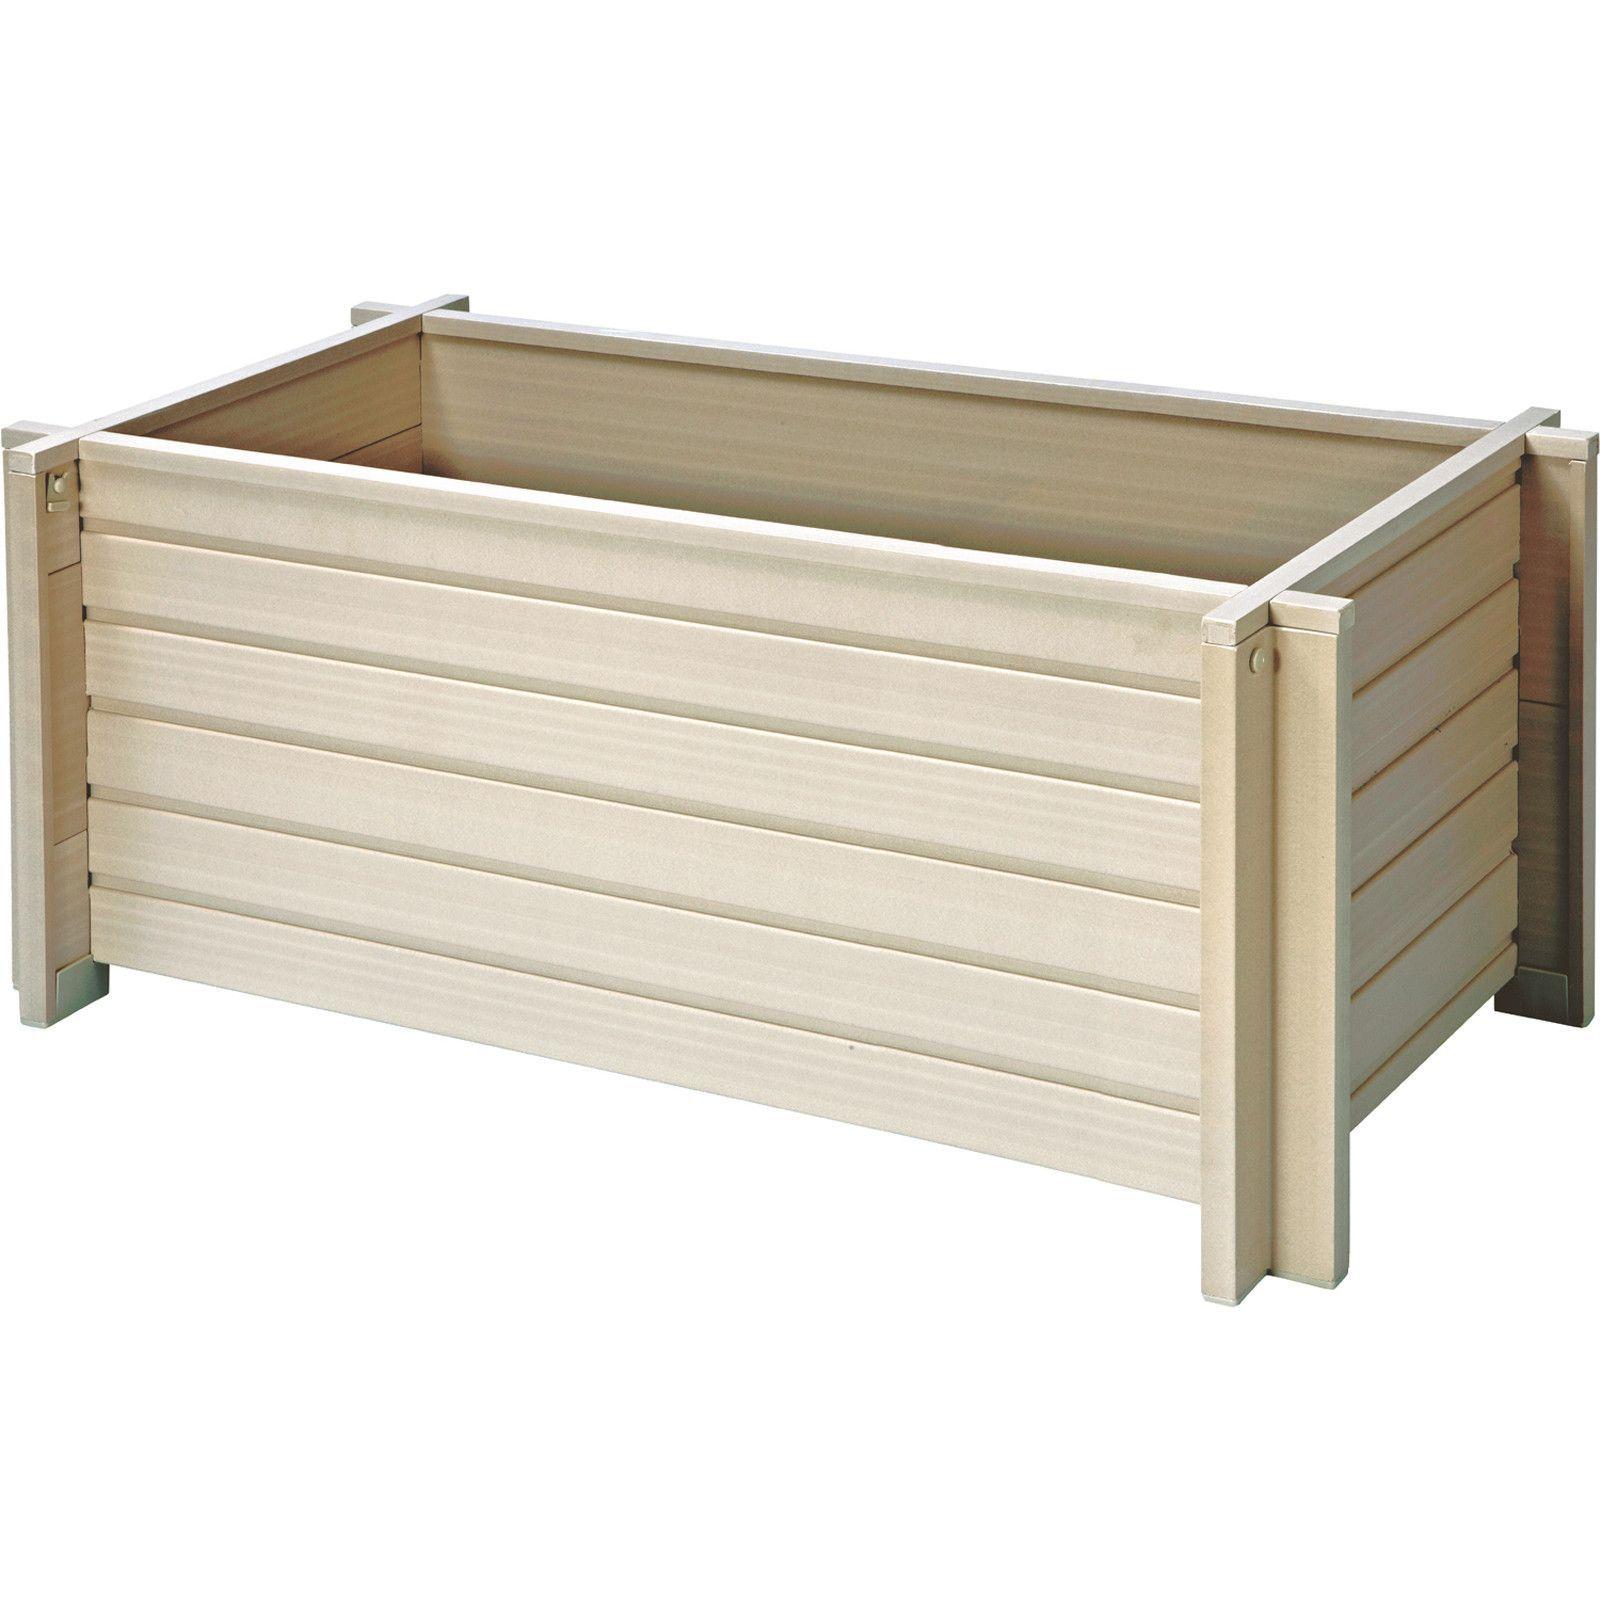 EcoFLEX Rectangular Planter Box